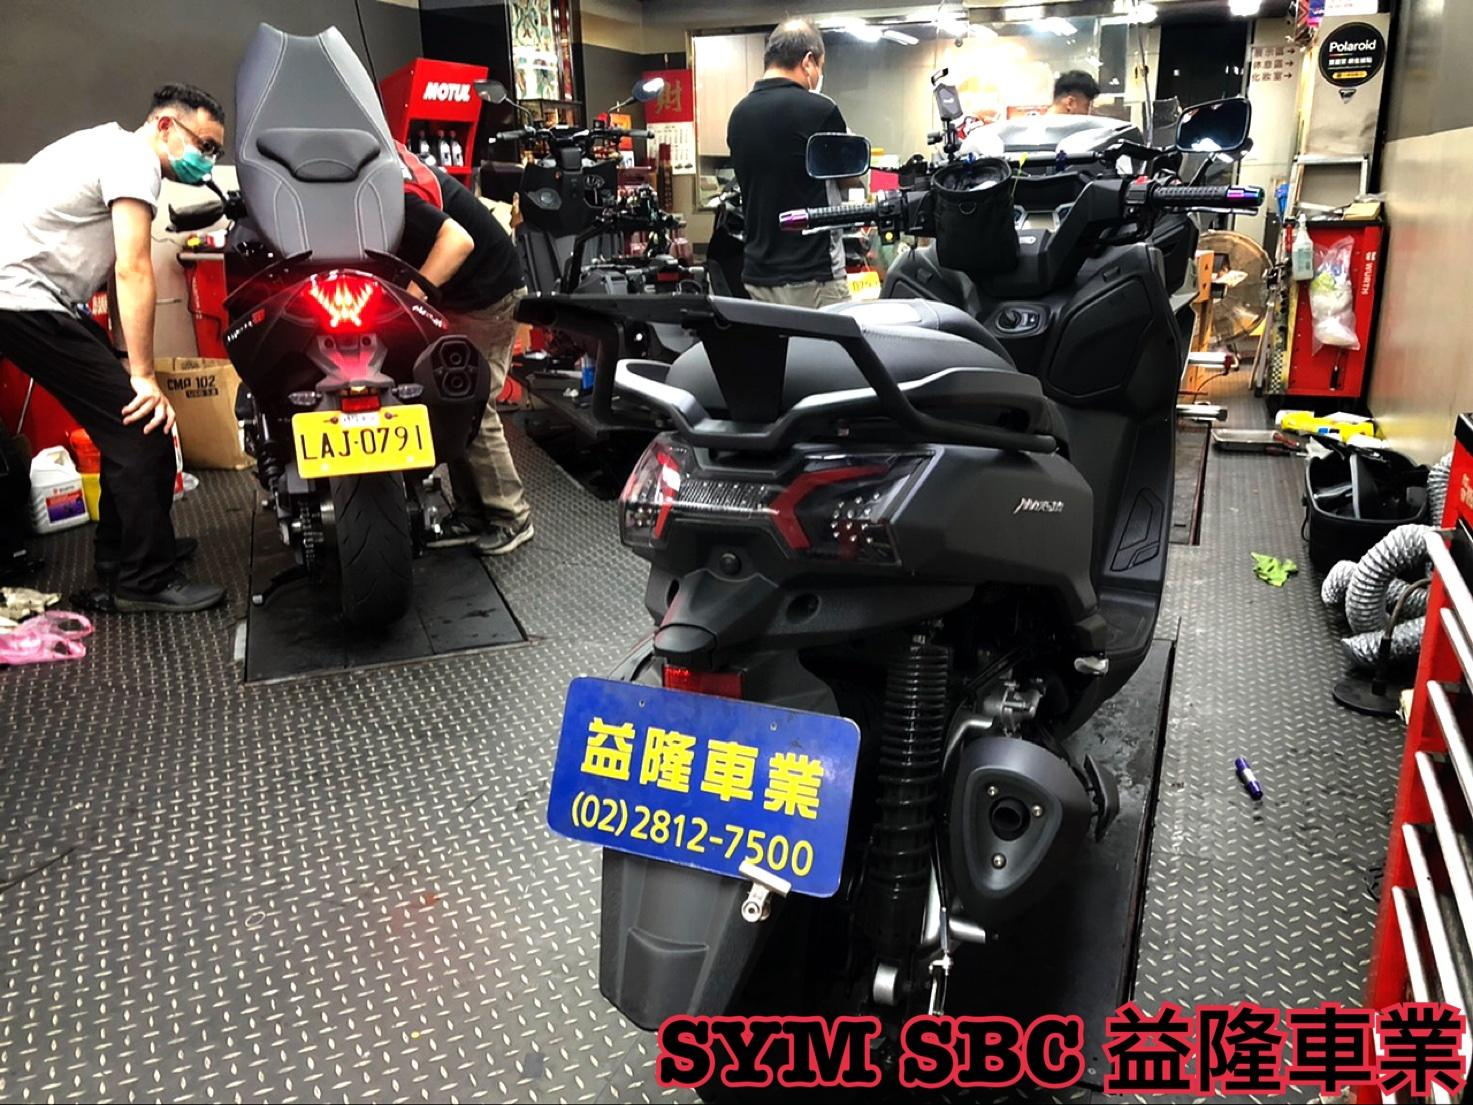 三陽 NEW MAXSYM 400 專用後箱架*SYM SBC 益隆車業*